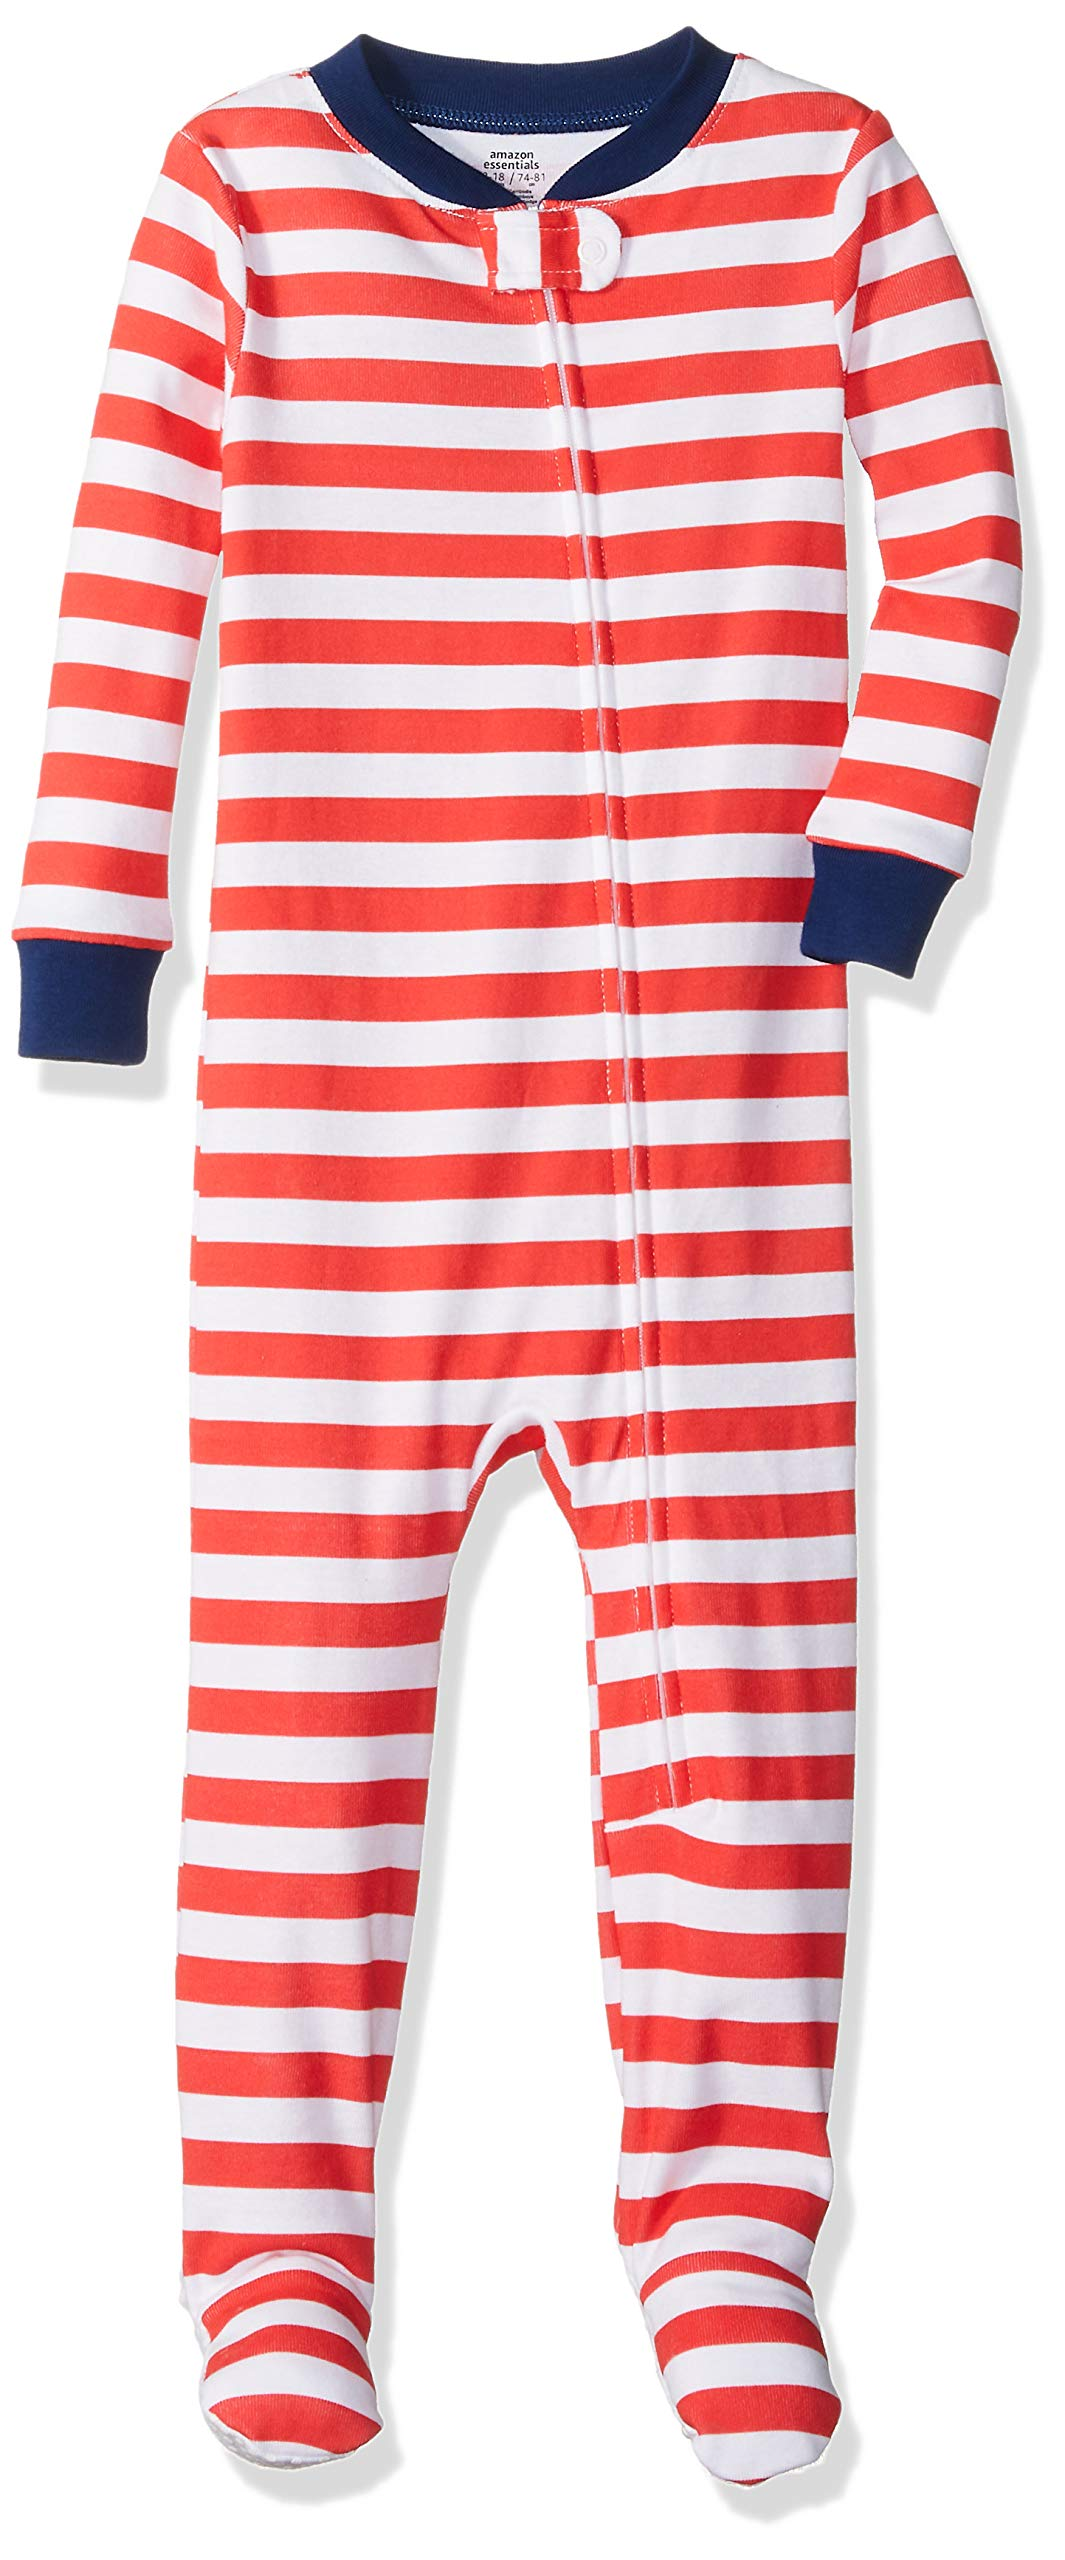 Baby Snug-fit Cotton Footed Sleeper Pajamas